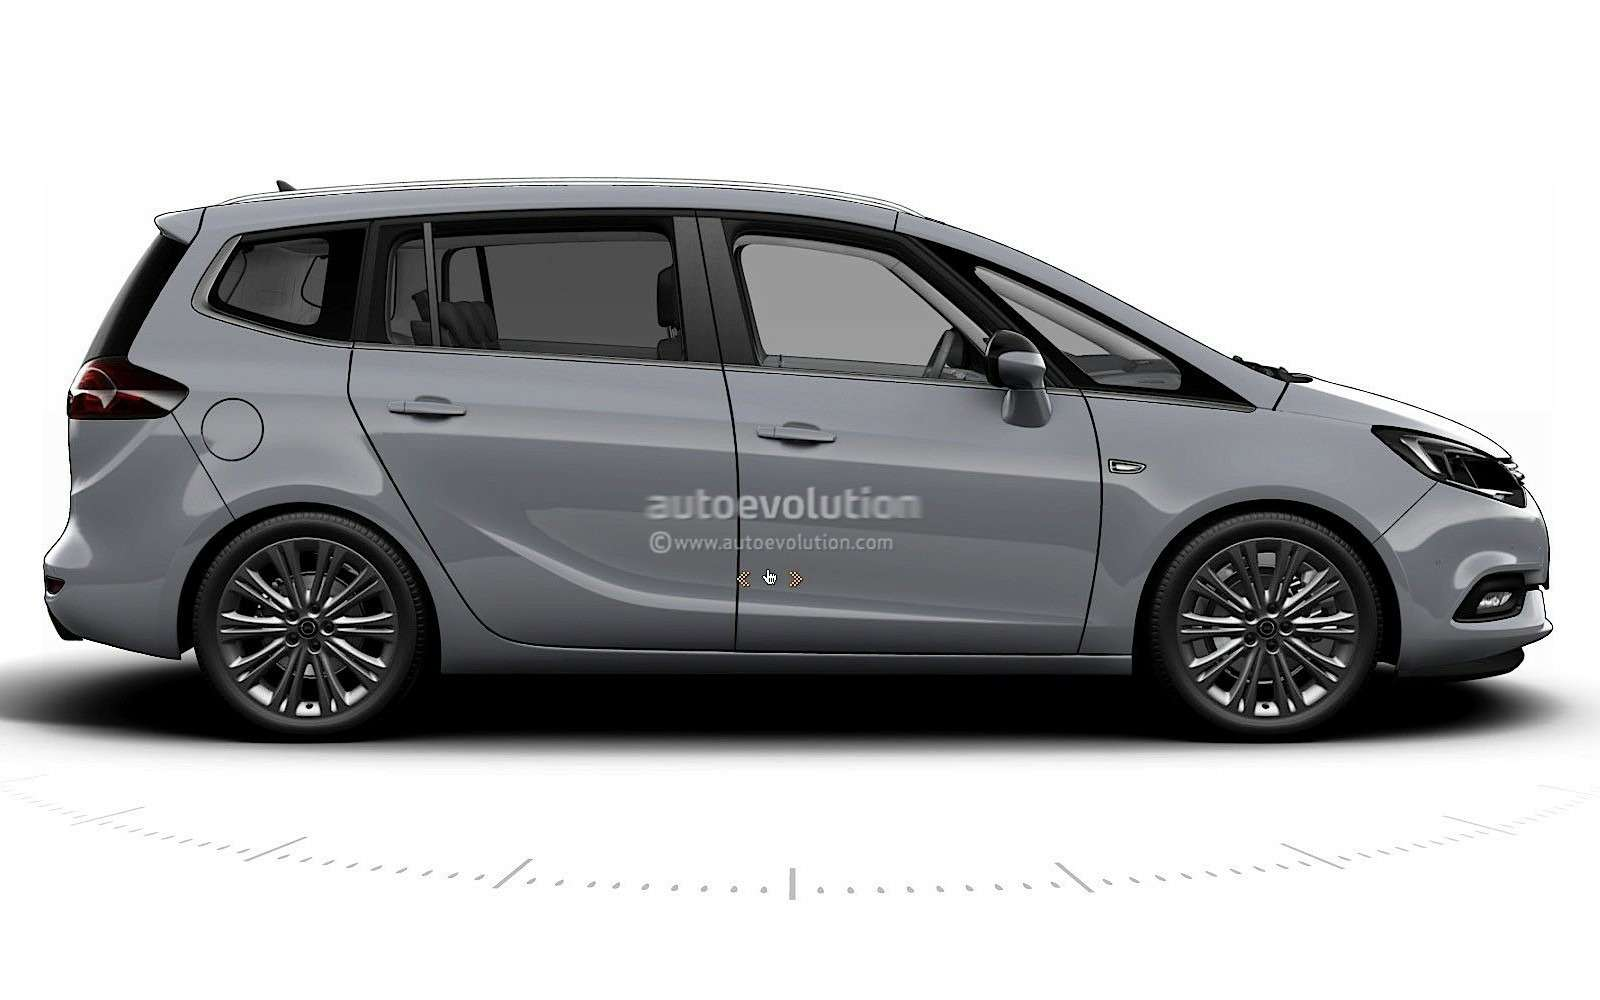 Opel Zafira останется без «бумерангов»— фото 592023